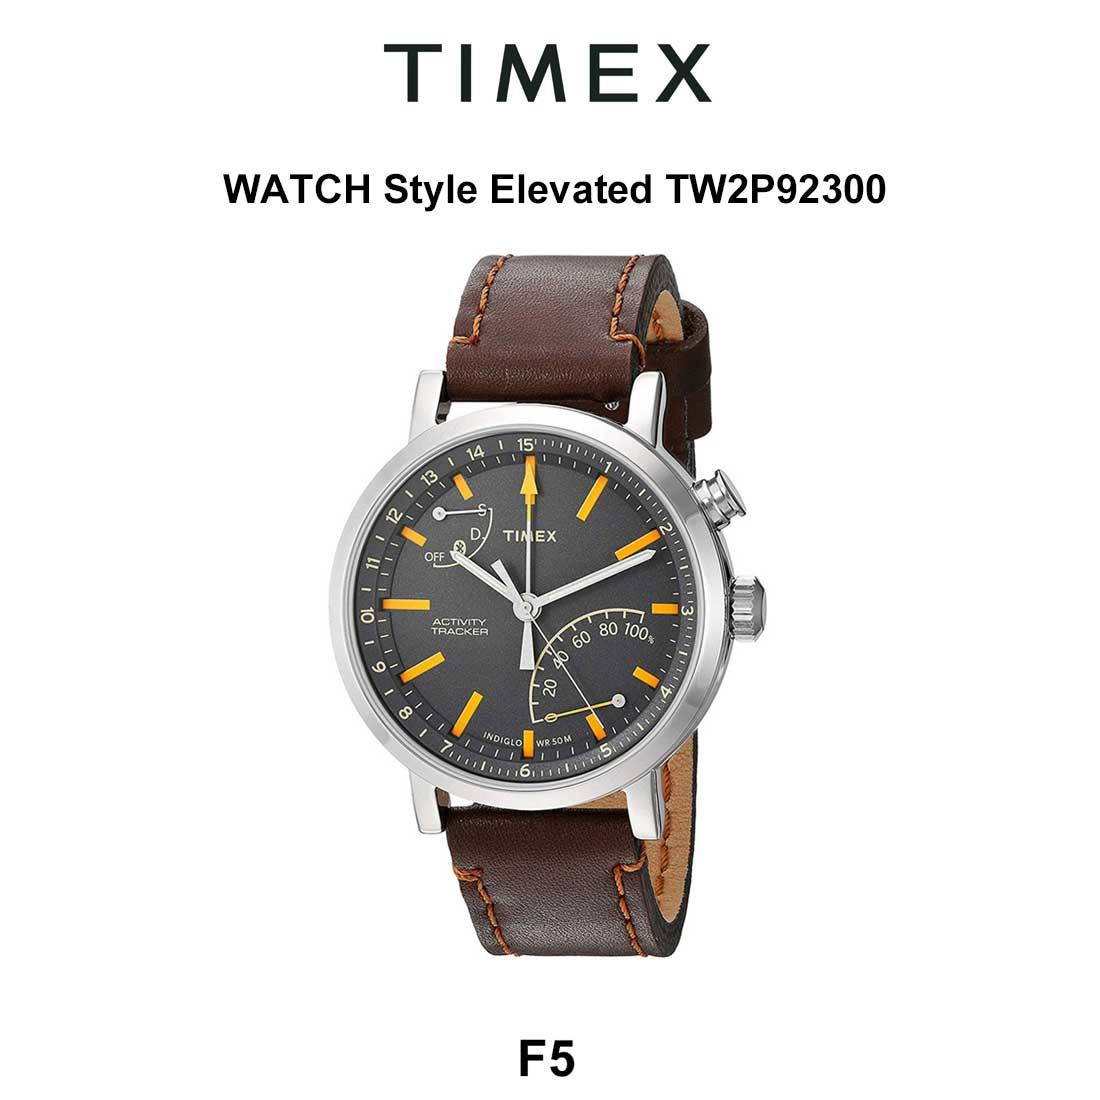 TIMEX(タイメックス)メンズ 腕時計 WATCH Style Elevated TW2P92300